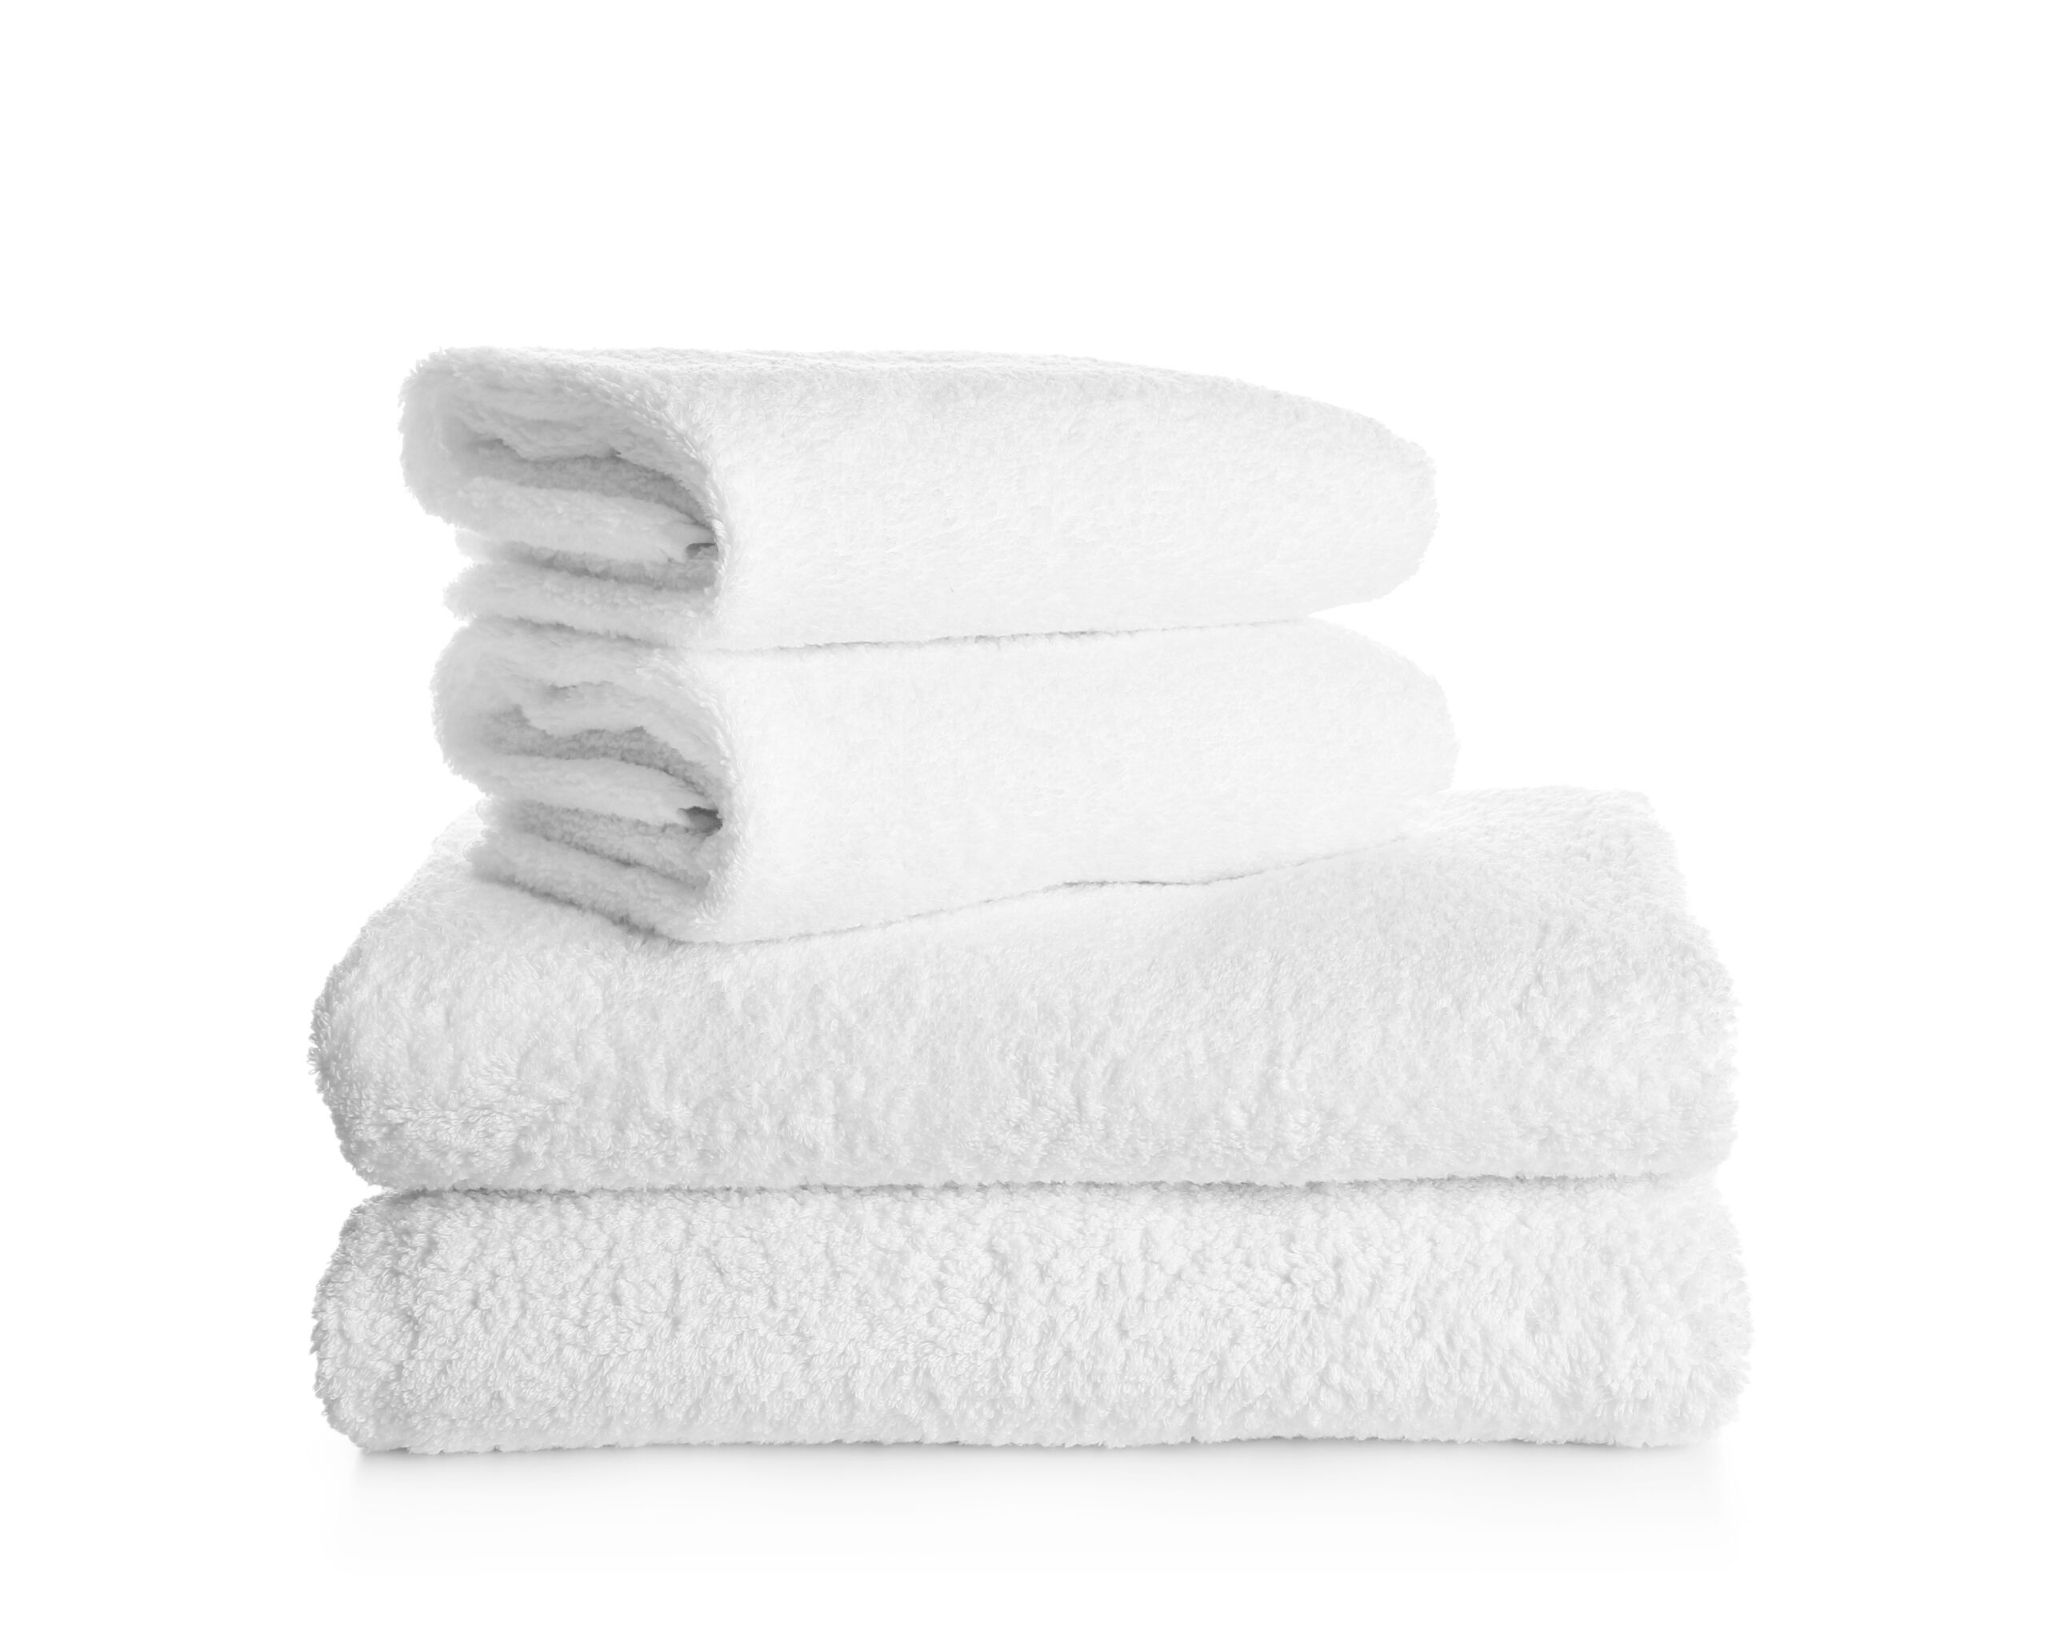 TruSelf Sporting Clubs gym towel service